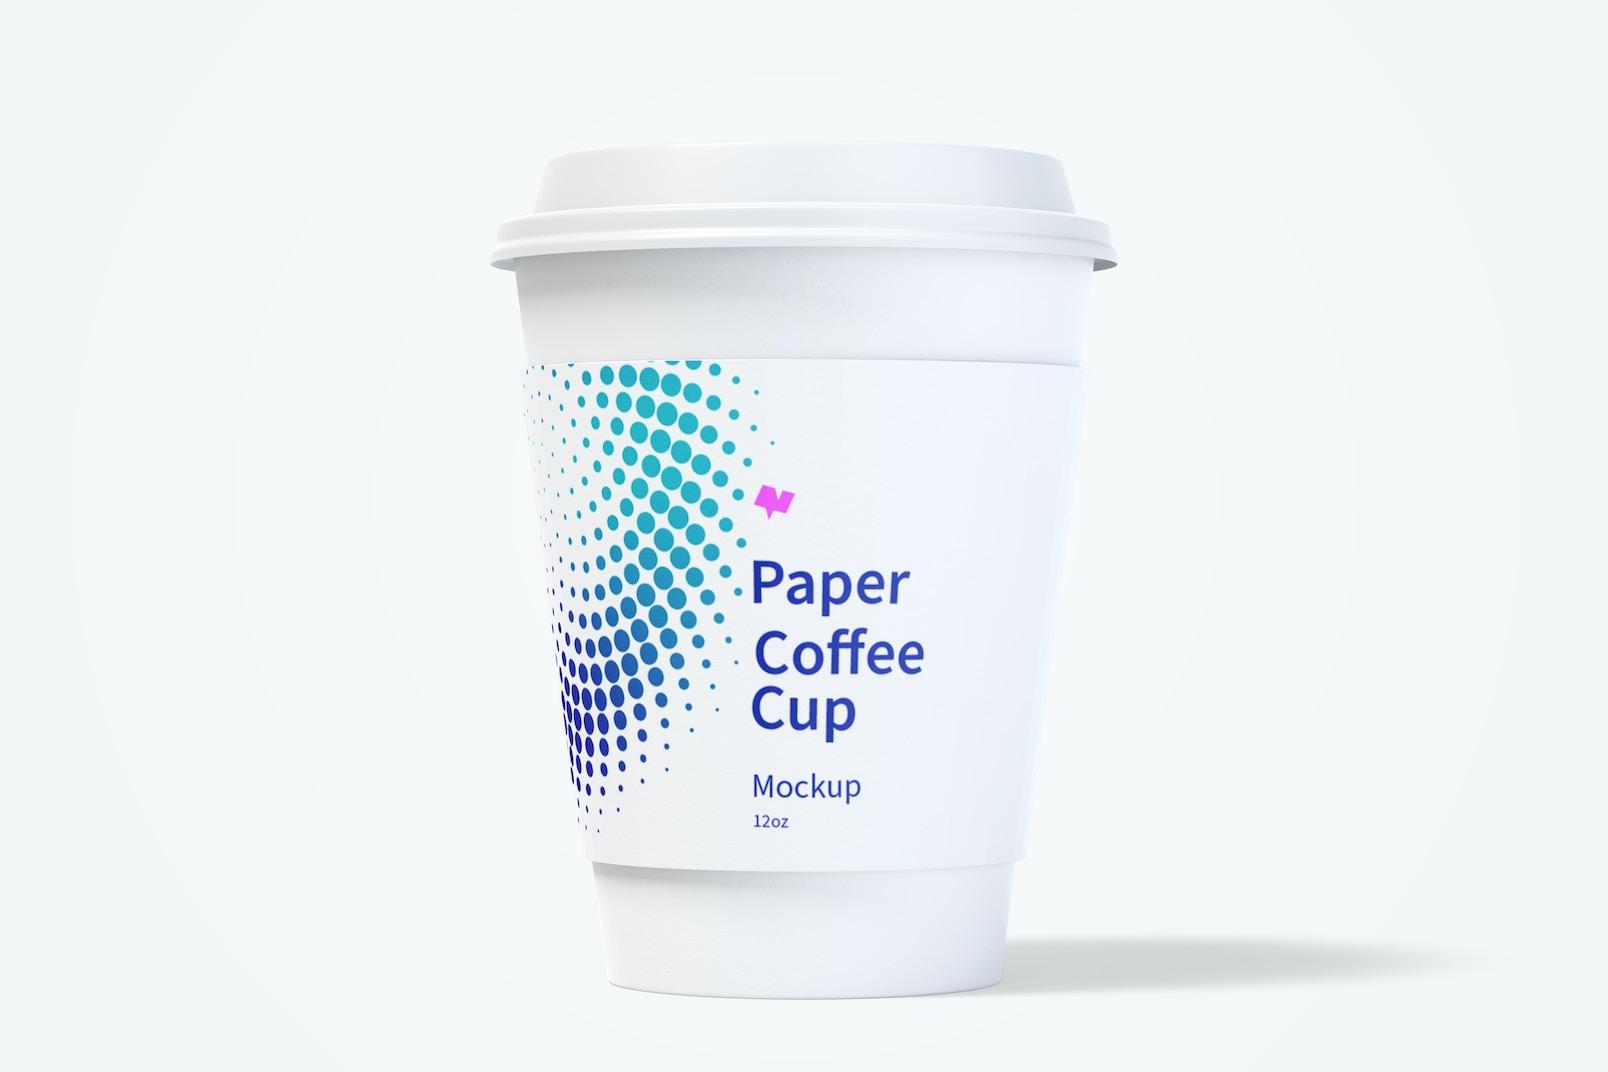 12oz Paper Coffee Cup Mockup